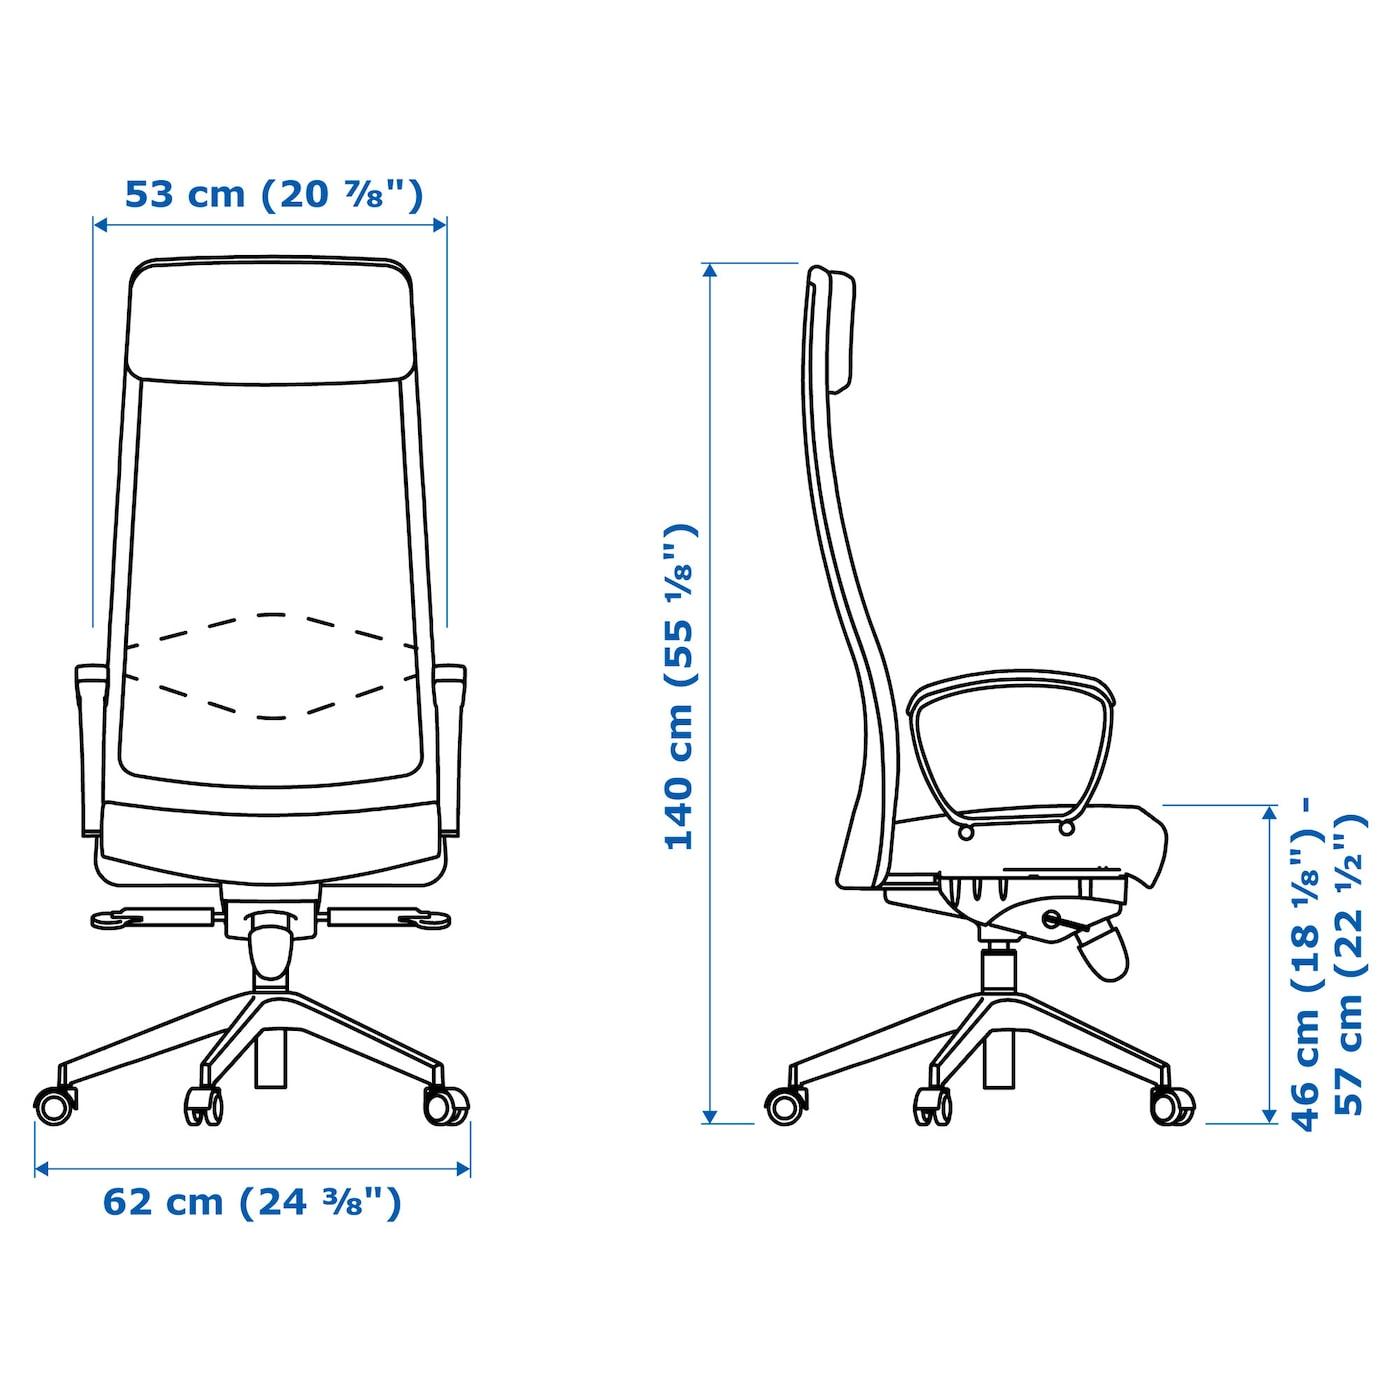 MARKUS Irodai szék fekete Glose Robust fekete